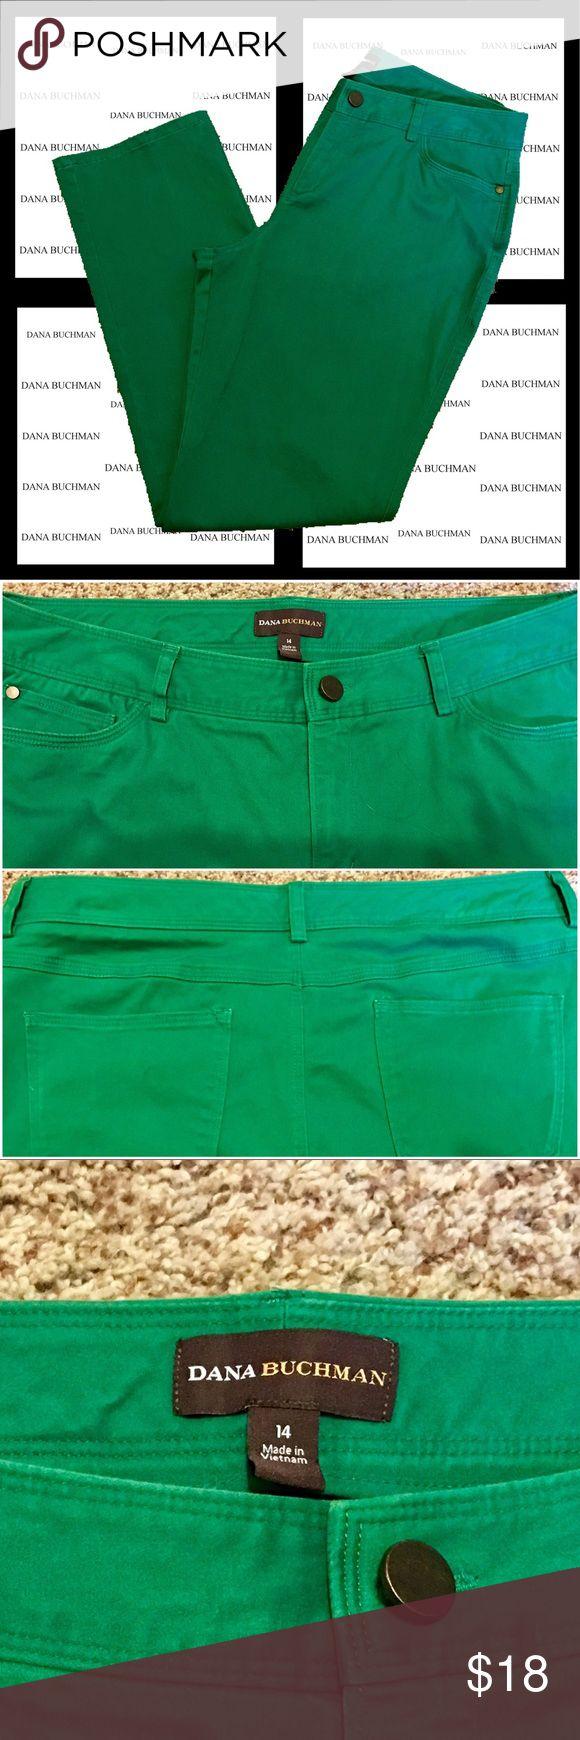 Dana Bachman Kelly Green Pants A darker kelly green SOFT khaki pants. They do have some stretch. EUC. 97% cotton, 3% spandex. Dana Buchman Pants